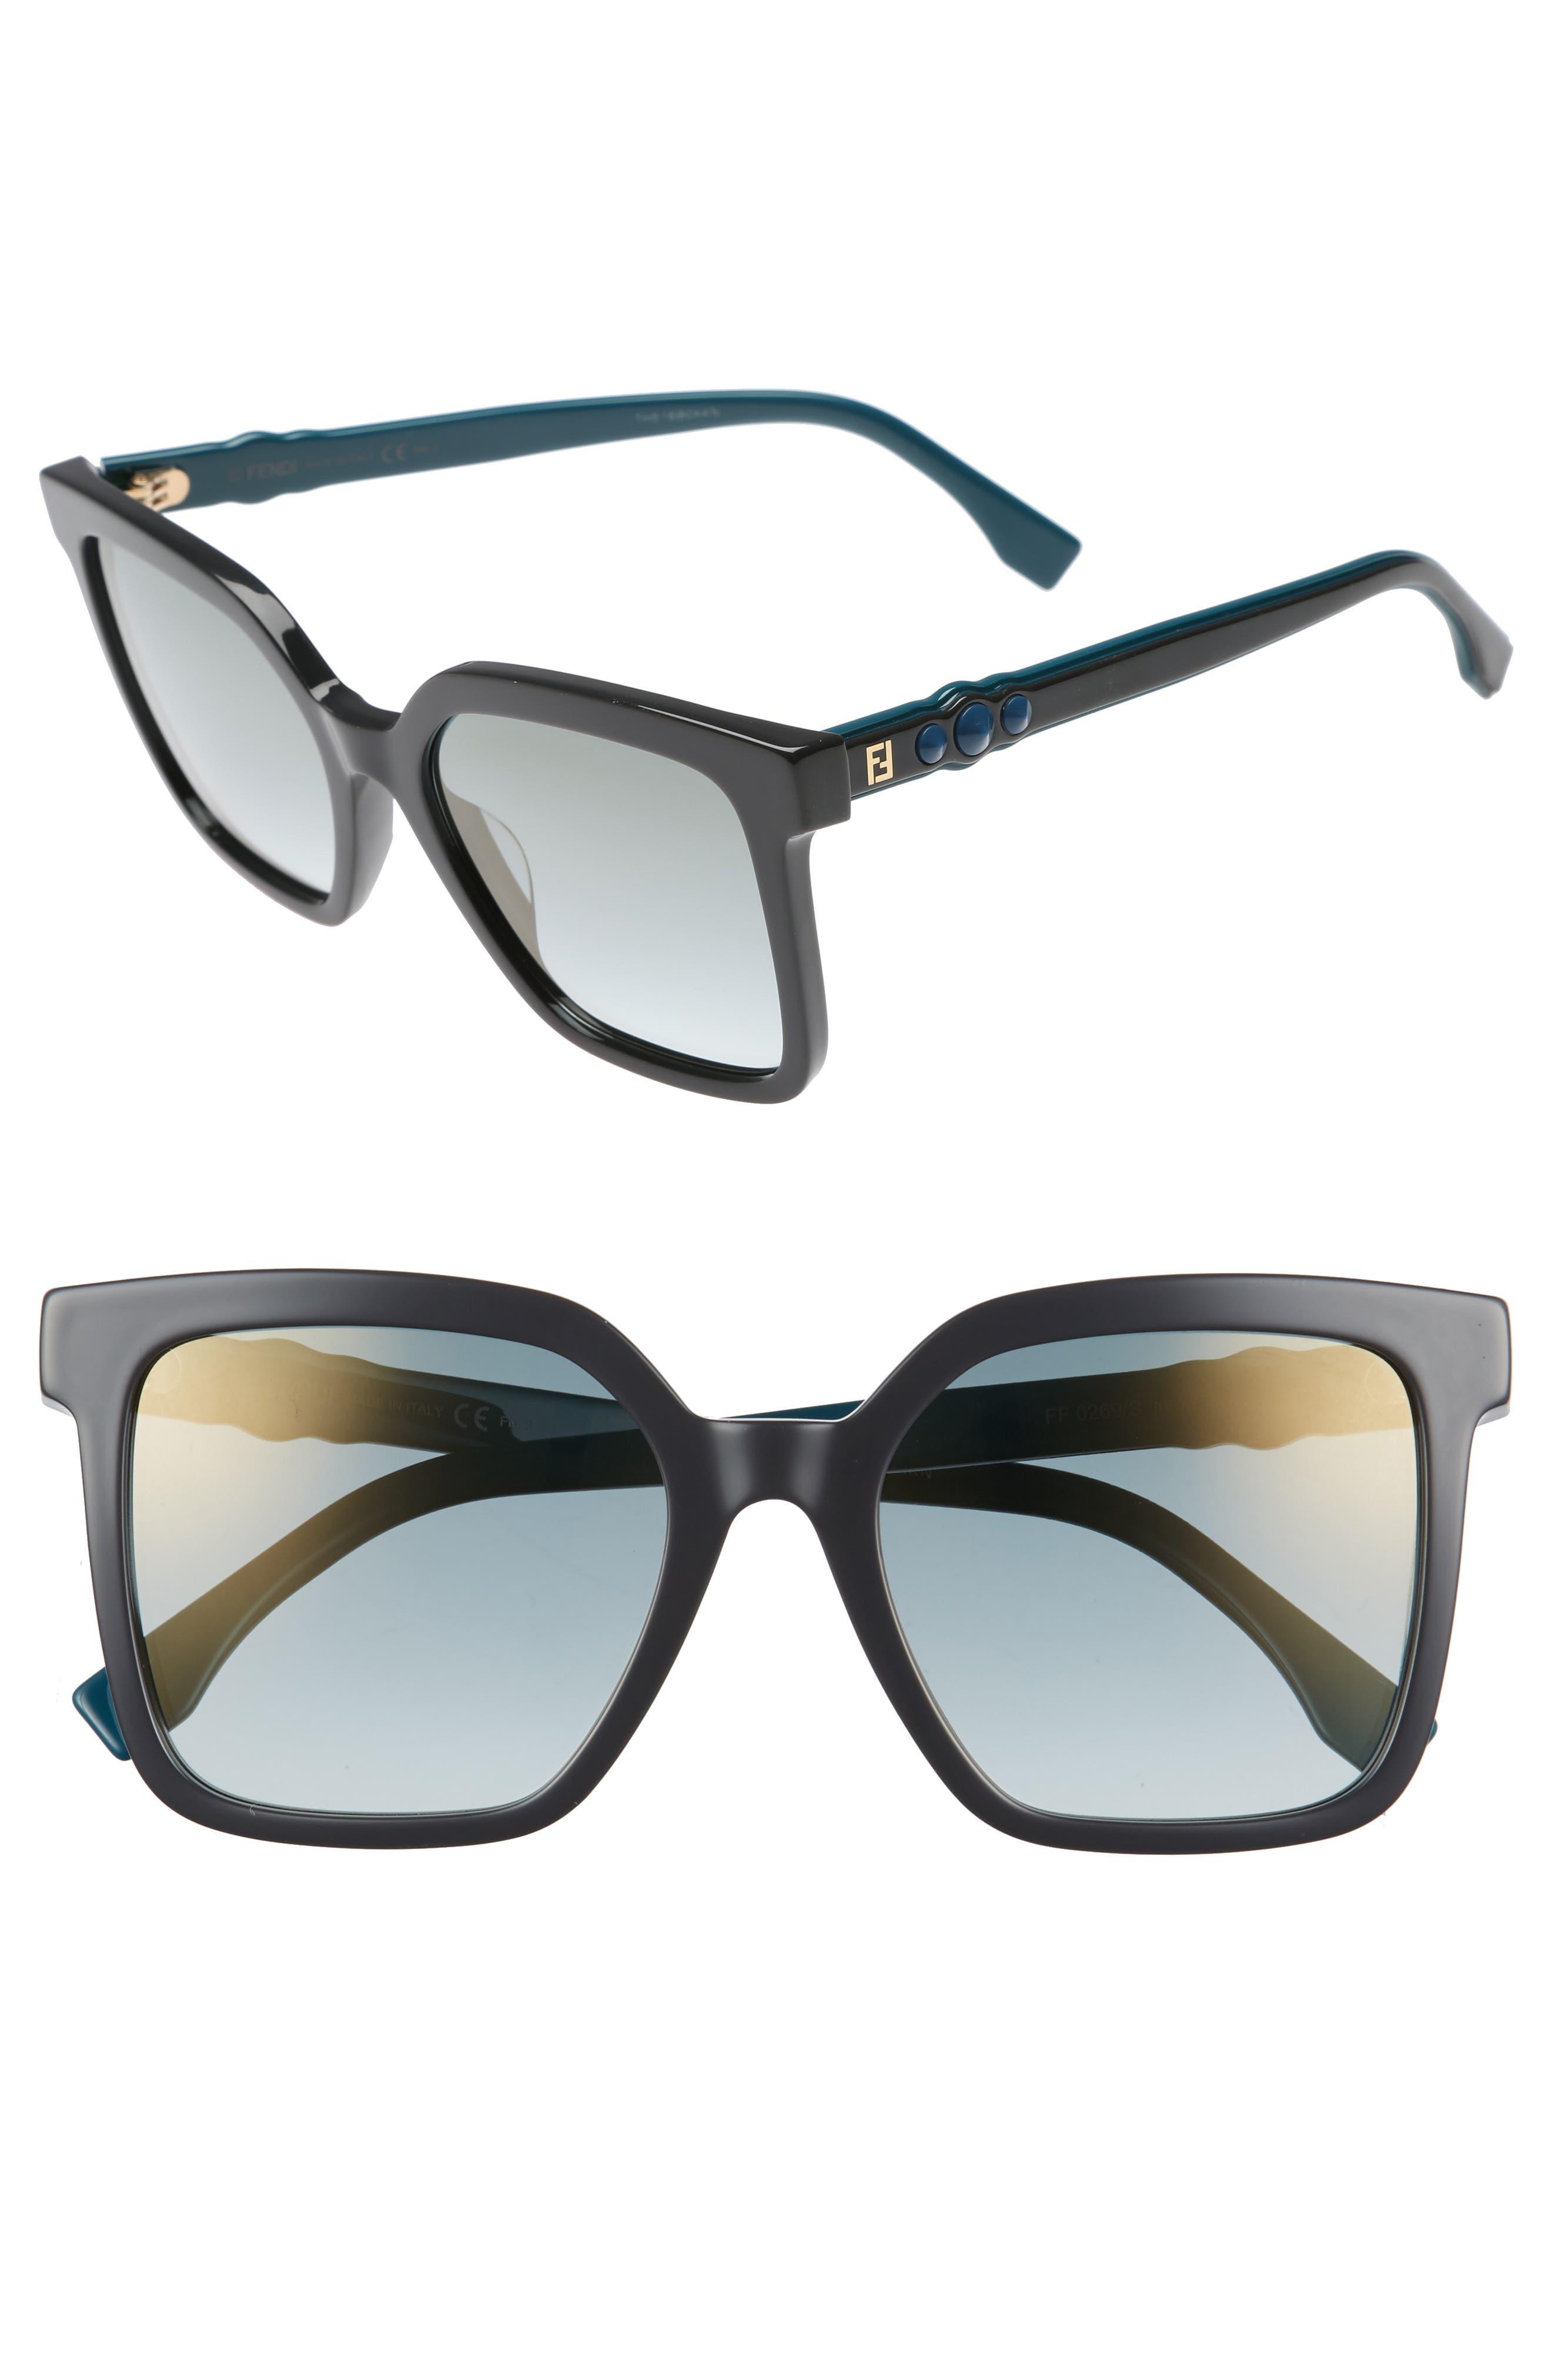 54mm Square Sunglasses,                         Main,                         color, GREY